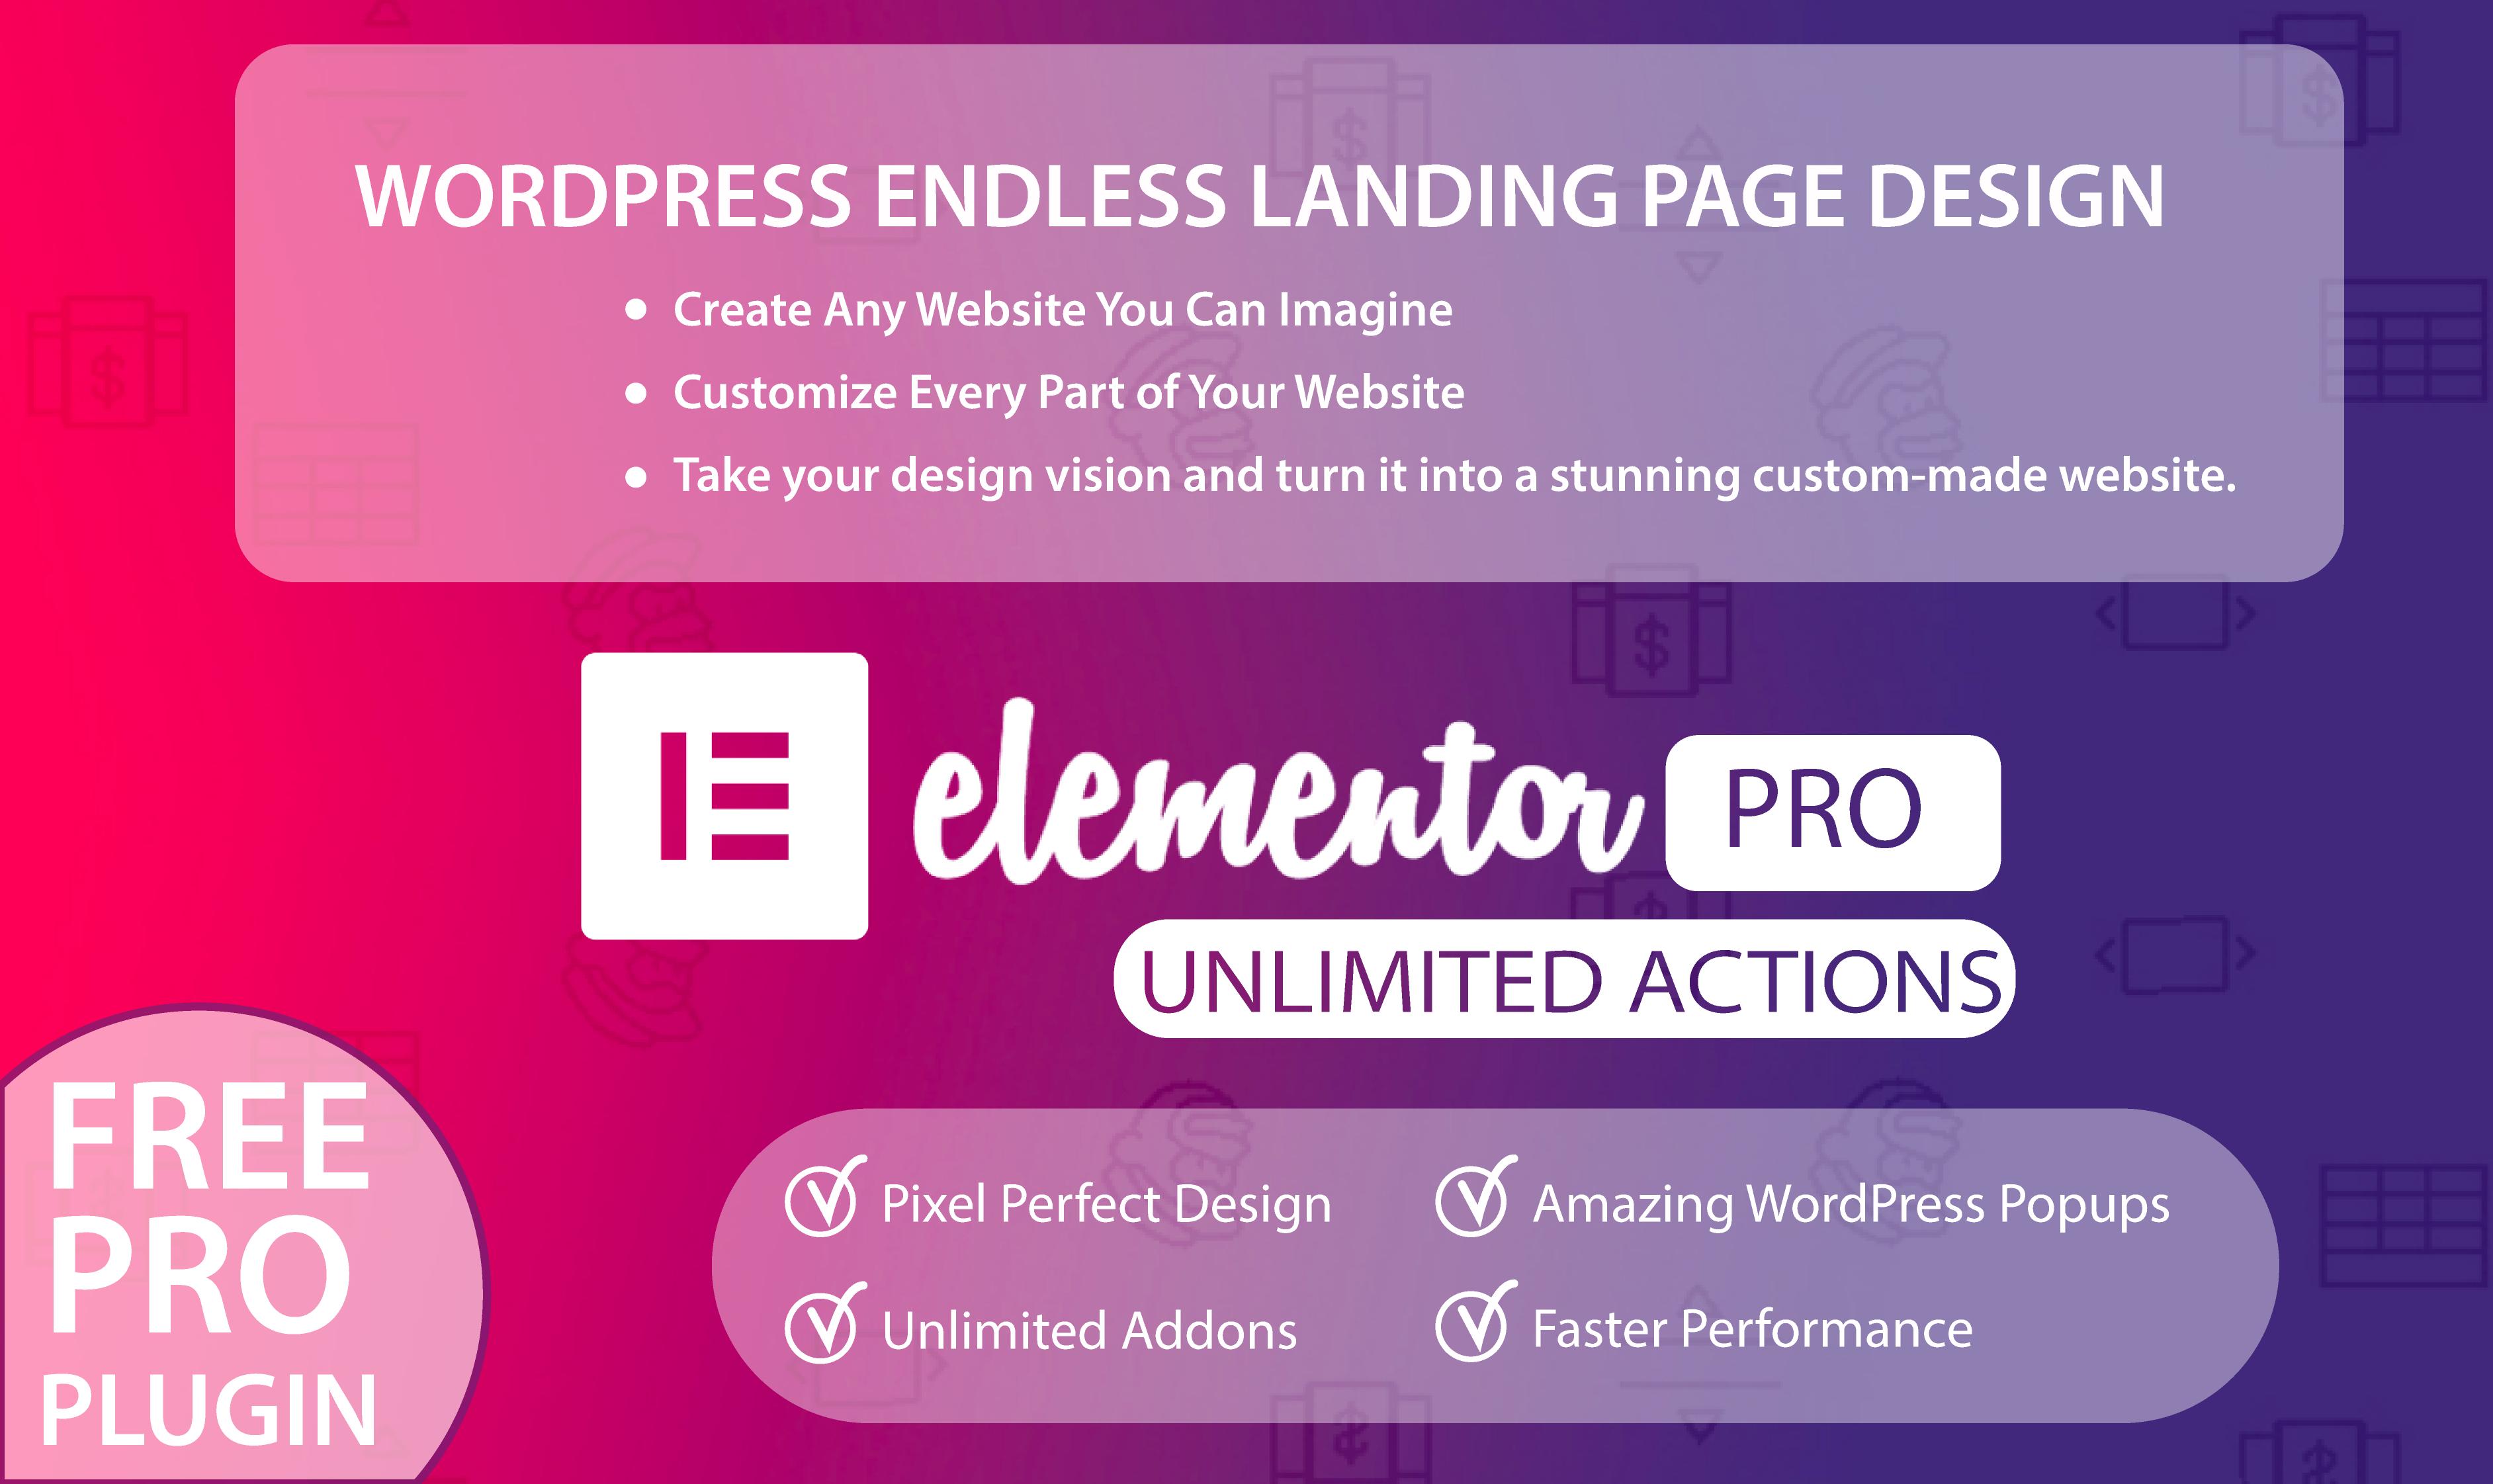 Endless WordPress Design Using Elementor Pro   Legiit